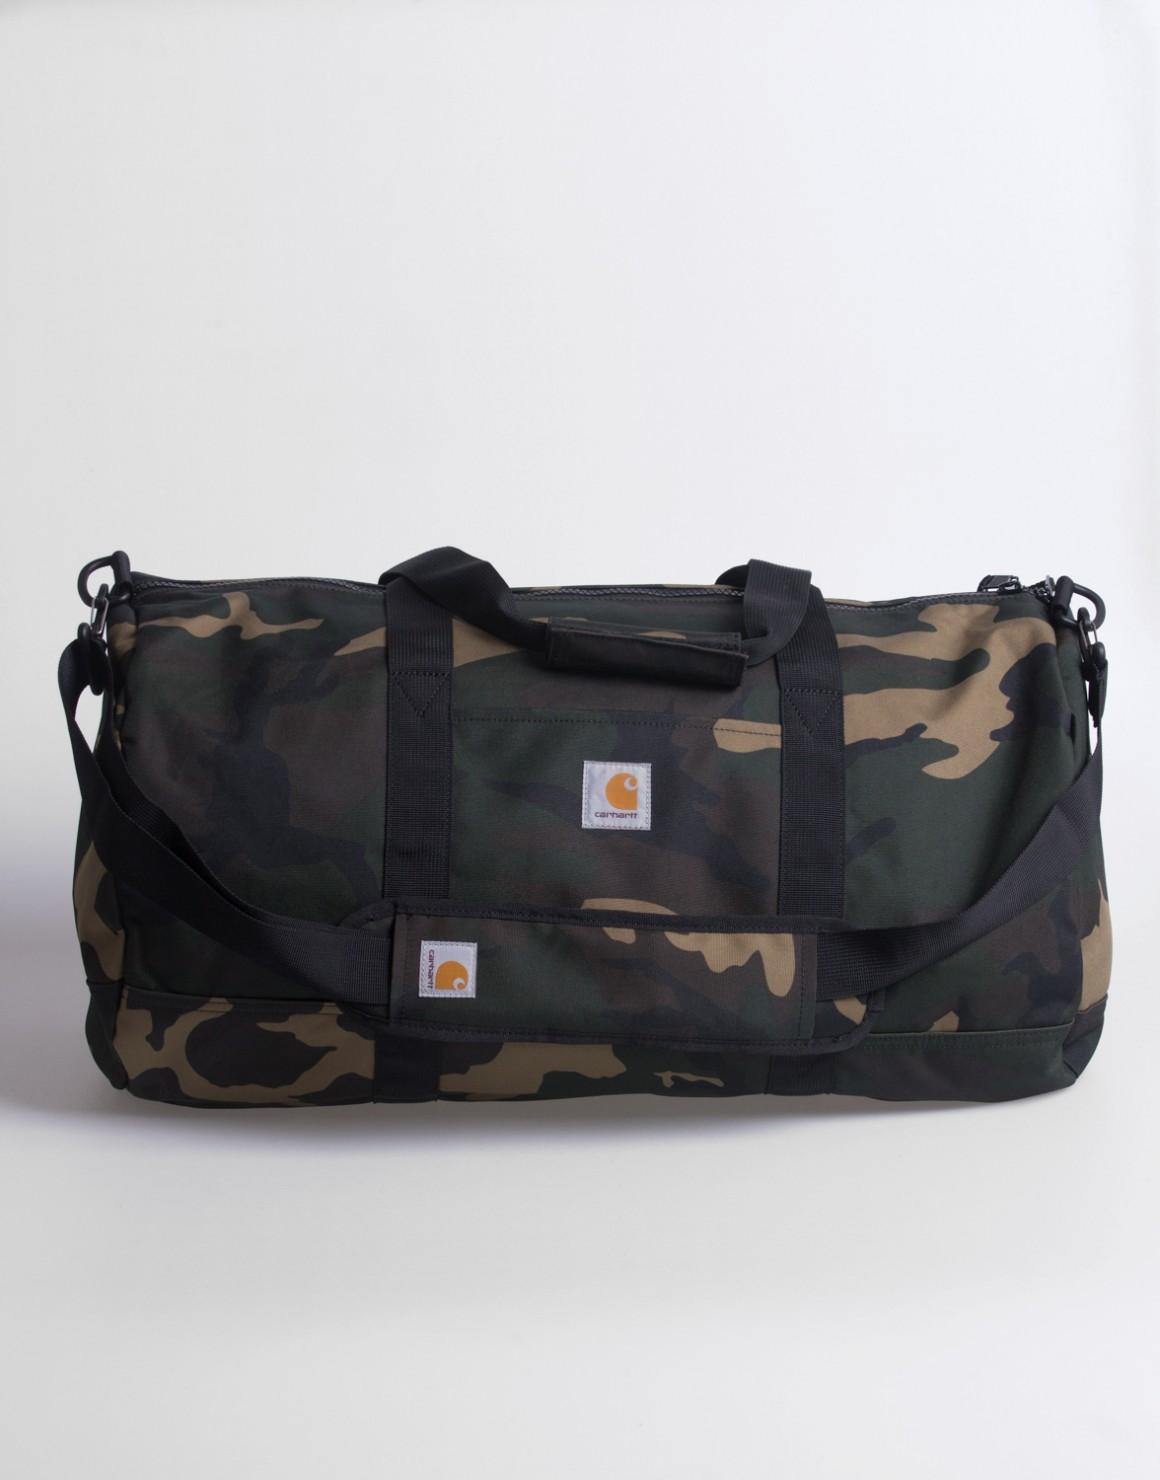 Wright Duffle Bag